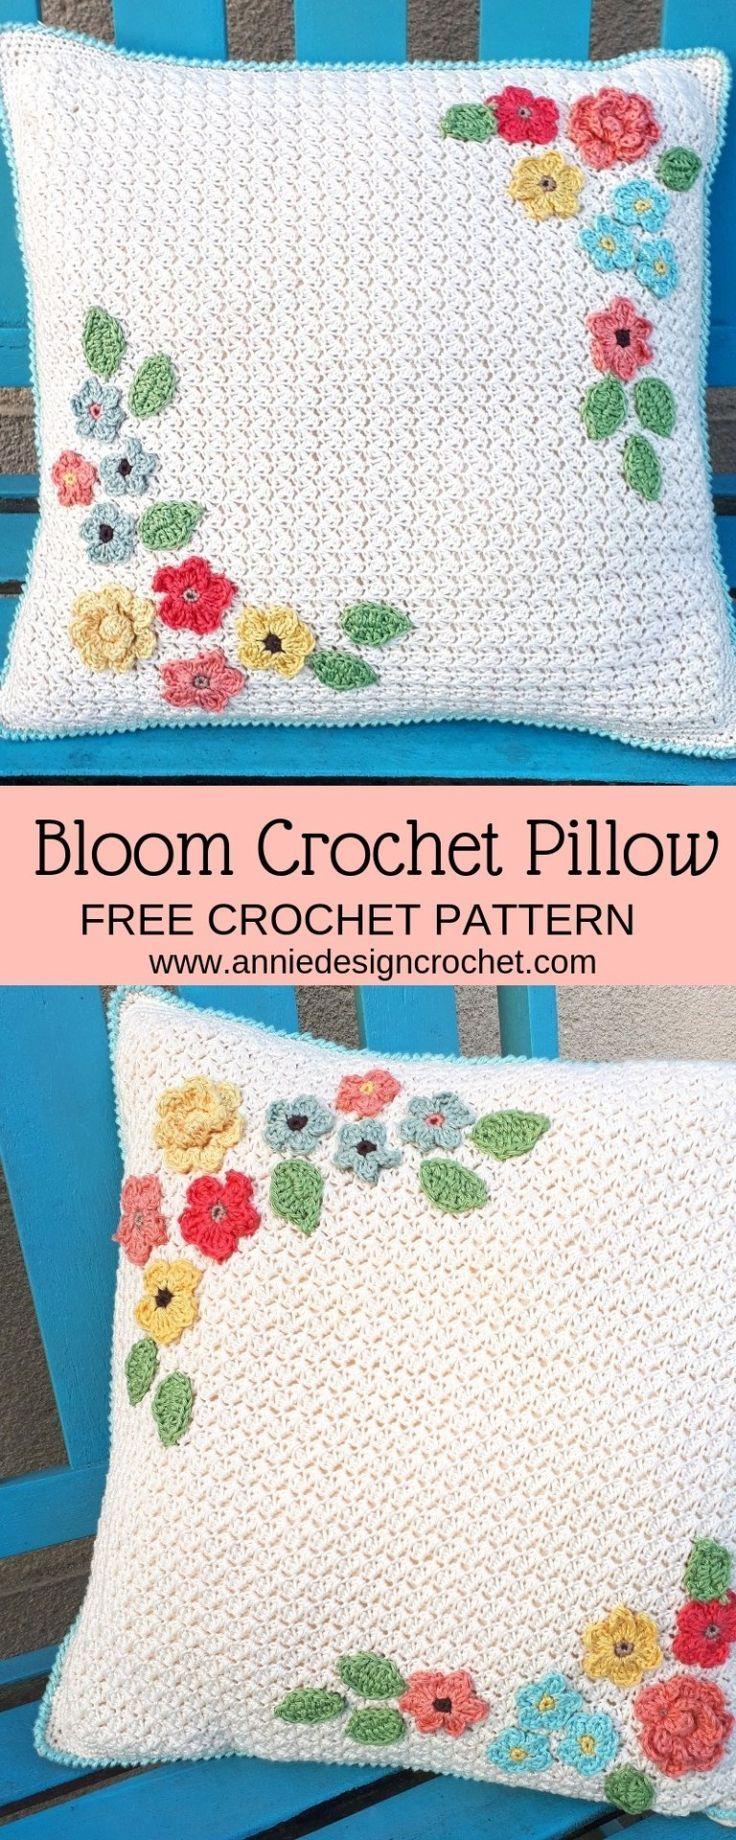 bloom pillow free crochet pattern for